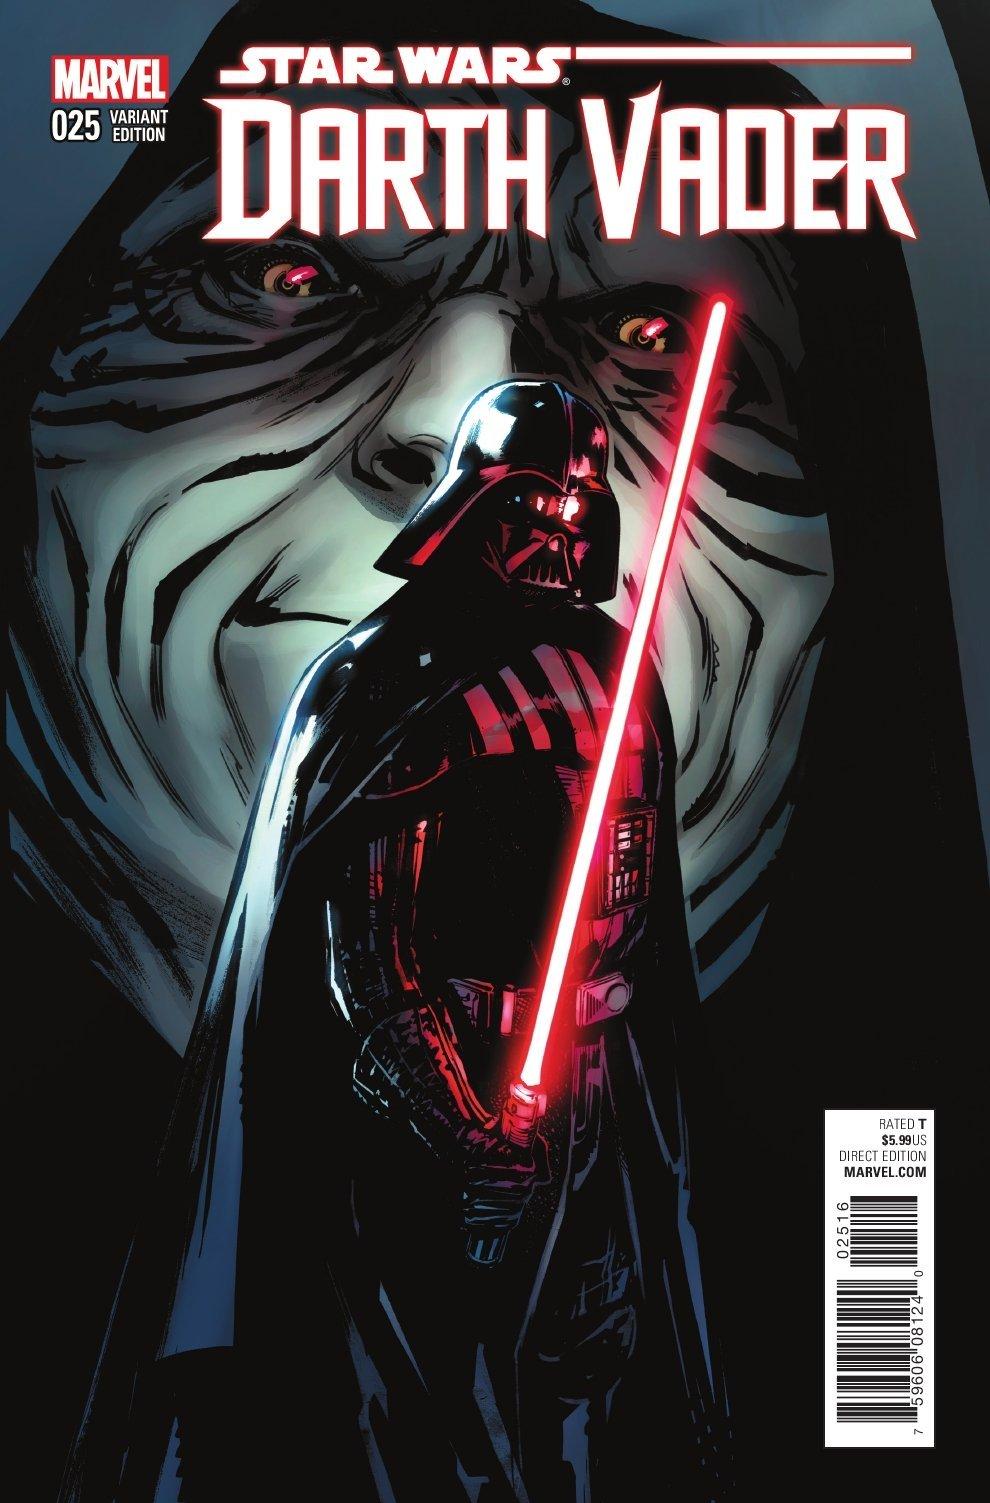 Darth Vader #25 (Sara Pichelli Variant Cover) (12.10.2016)